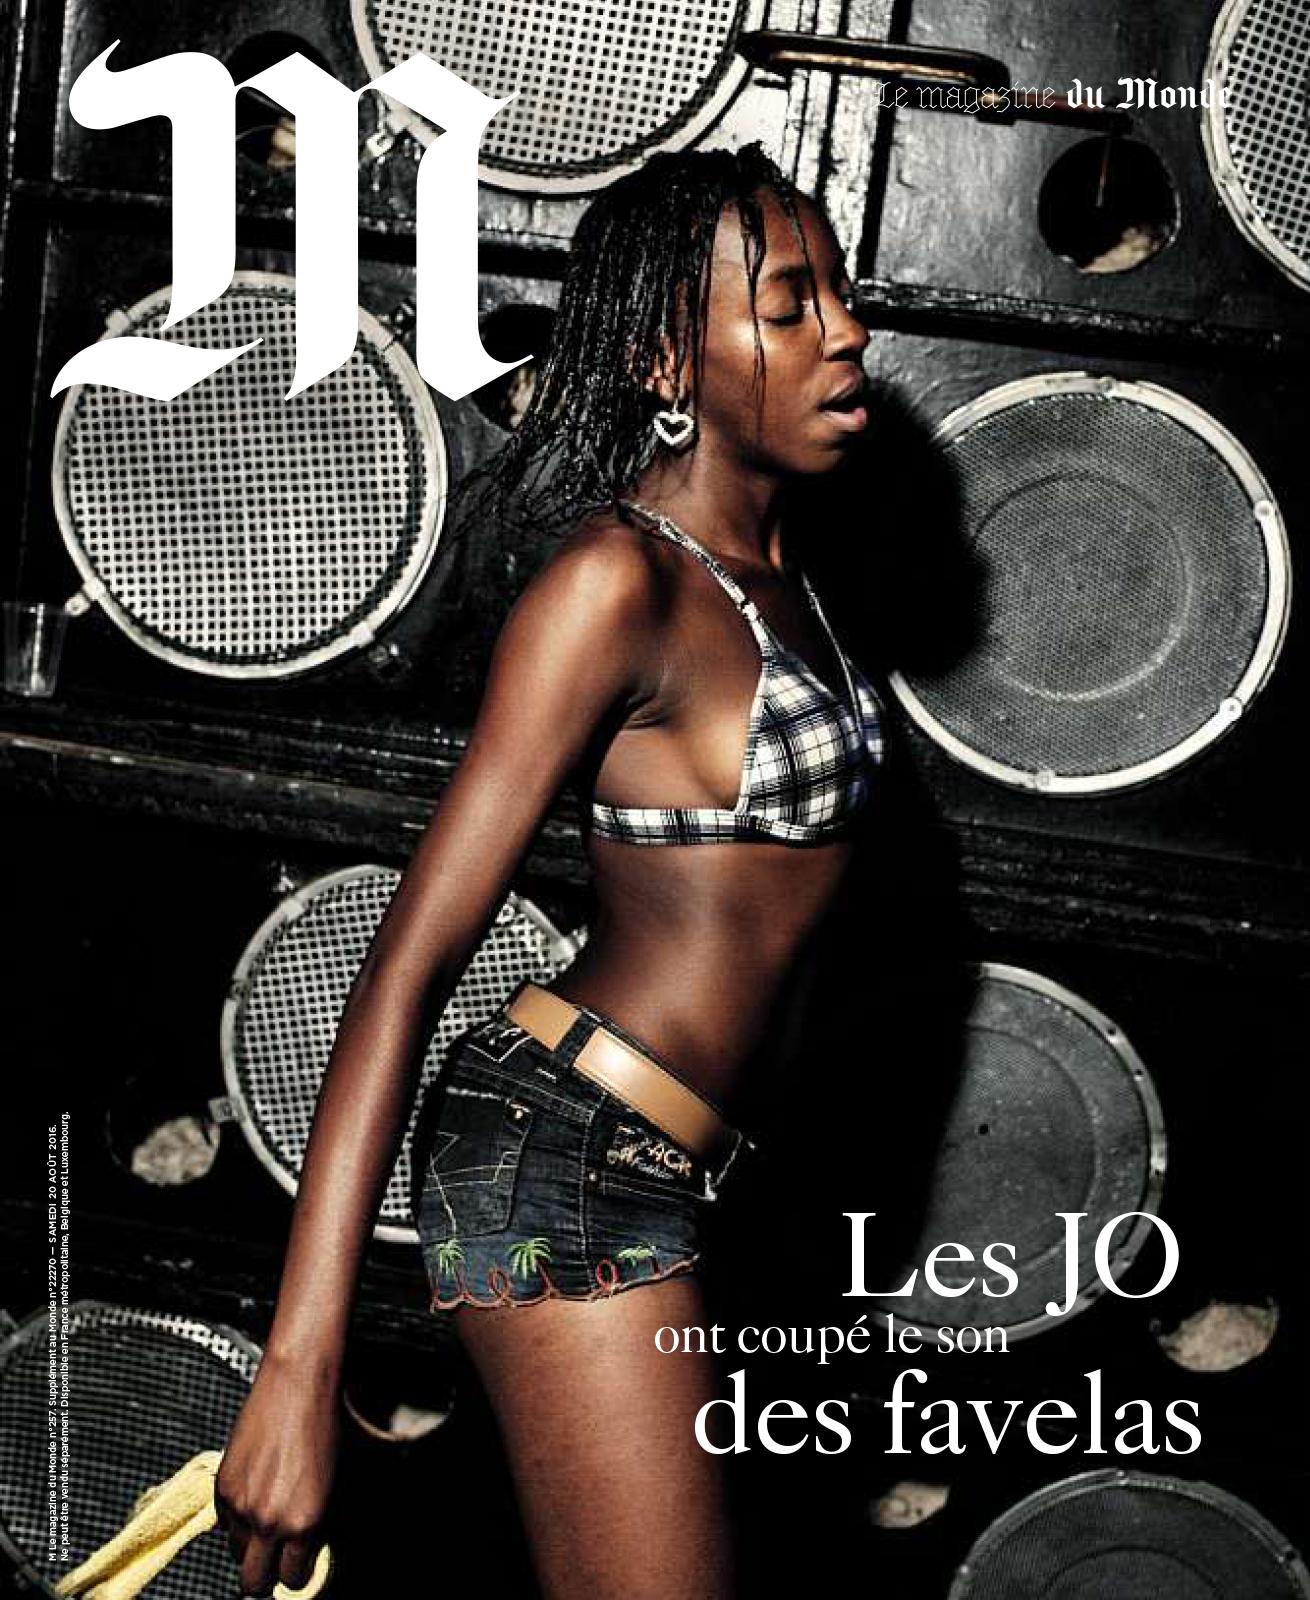 """M"" Le Monde - magazine"